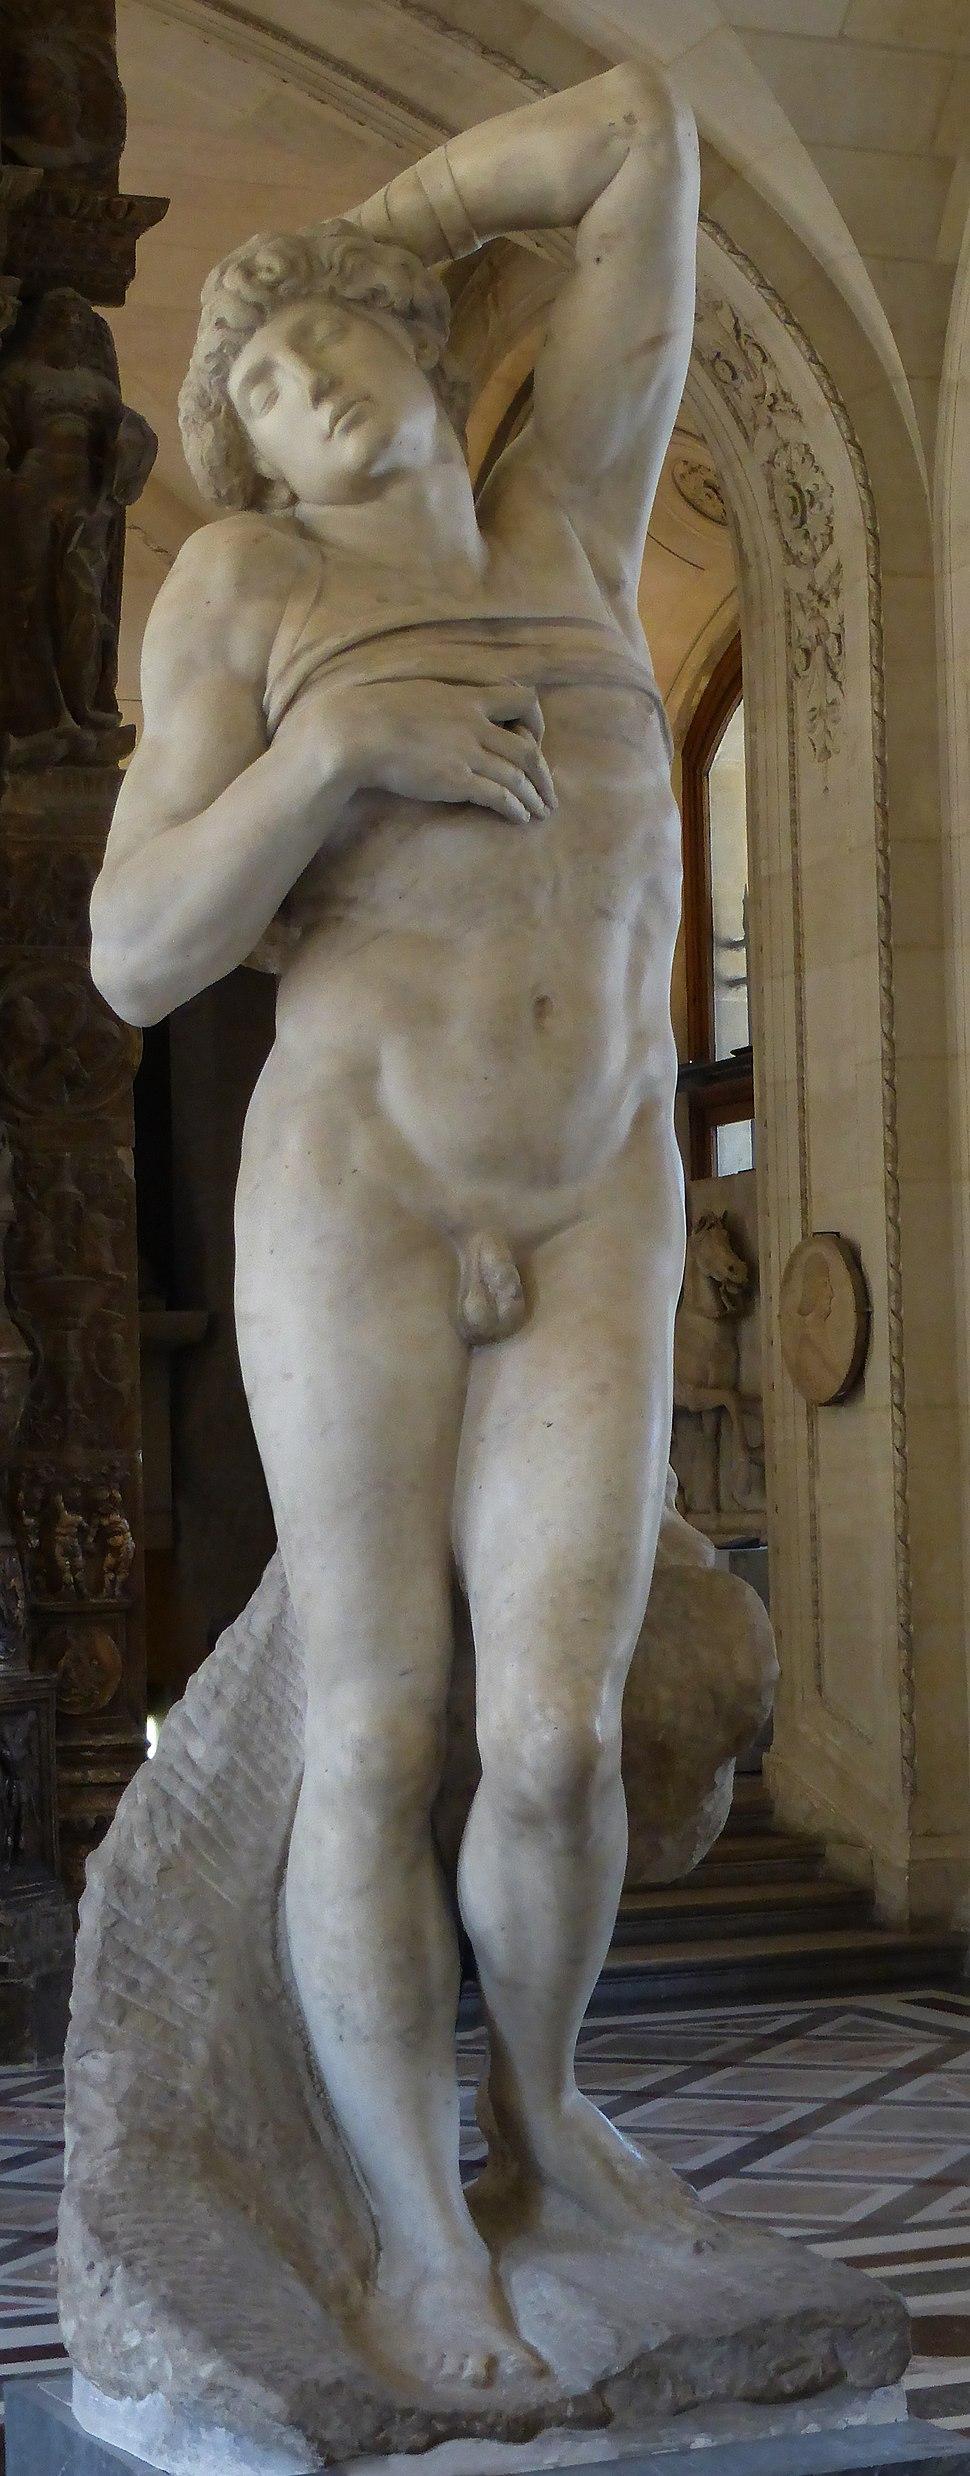 'Dying Slave' Michelangelo JBU001